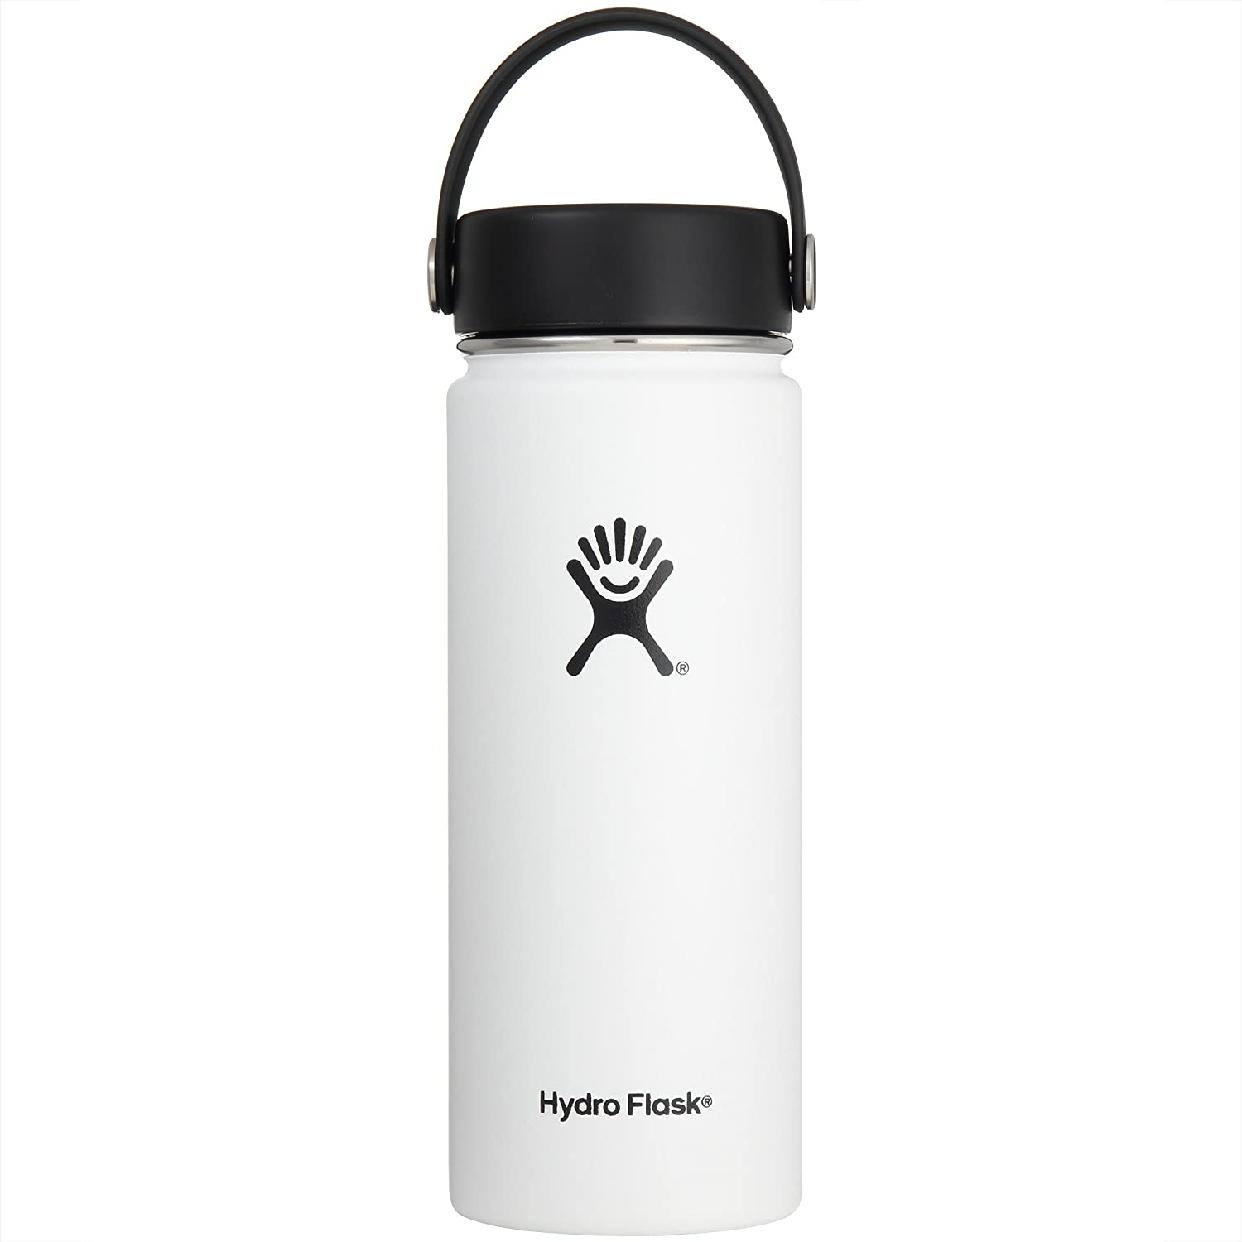 Hydro Flask(ハイドロフラスク) 18 oz Wide Mouth Whiteの商品画像